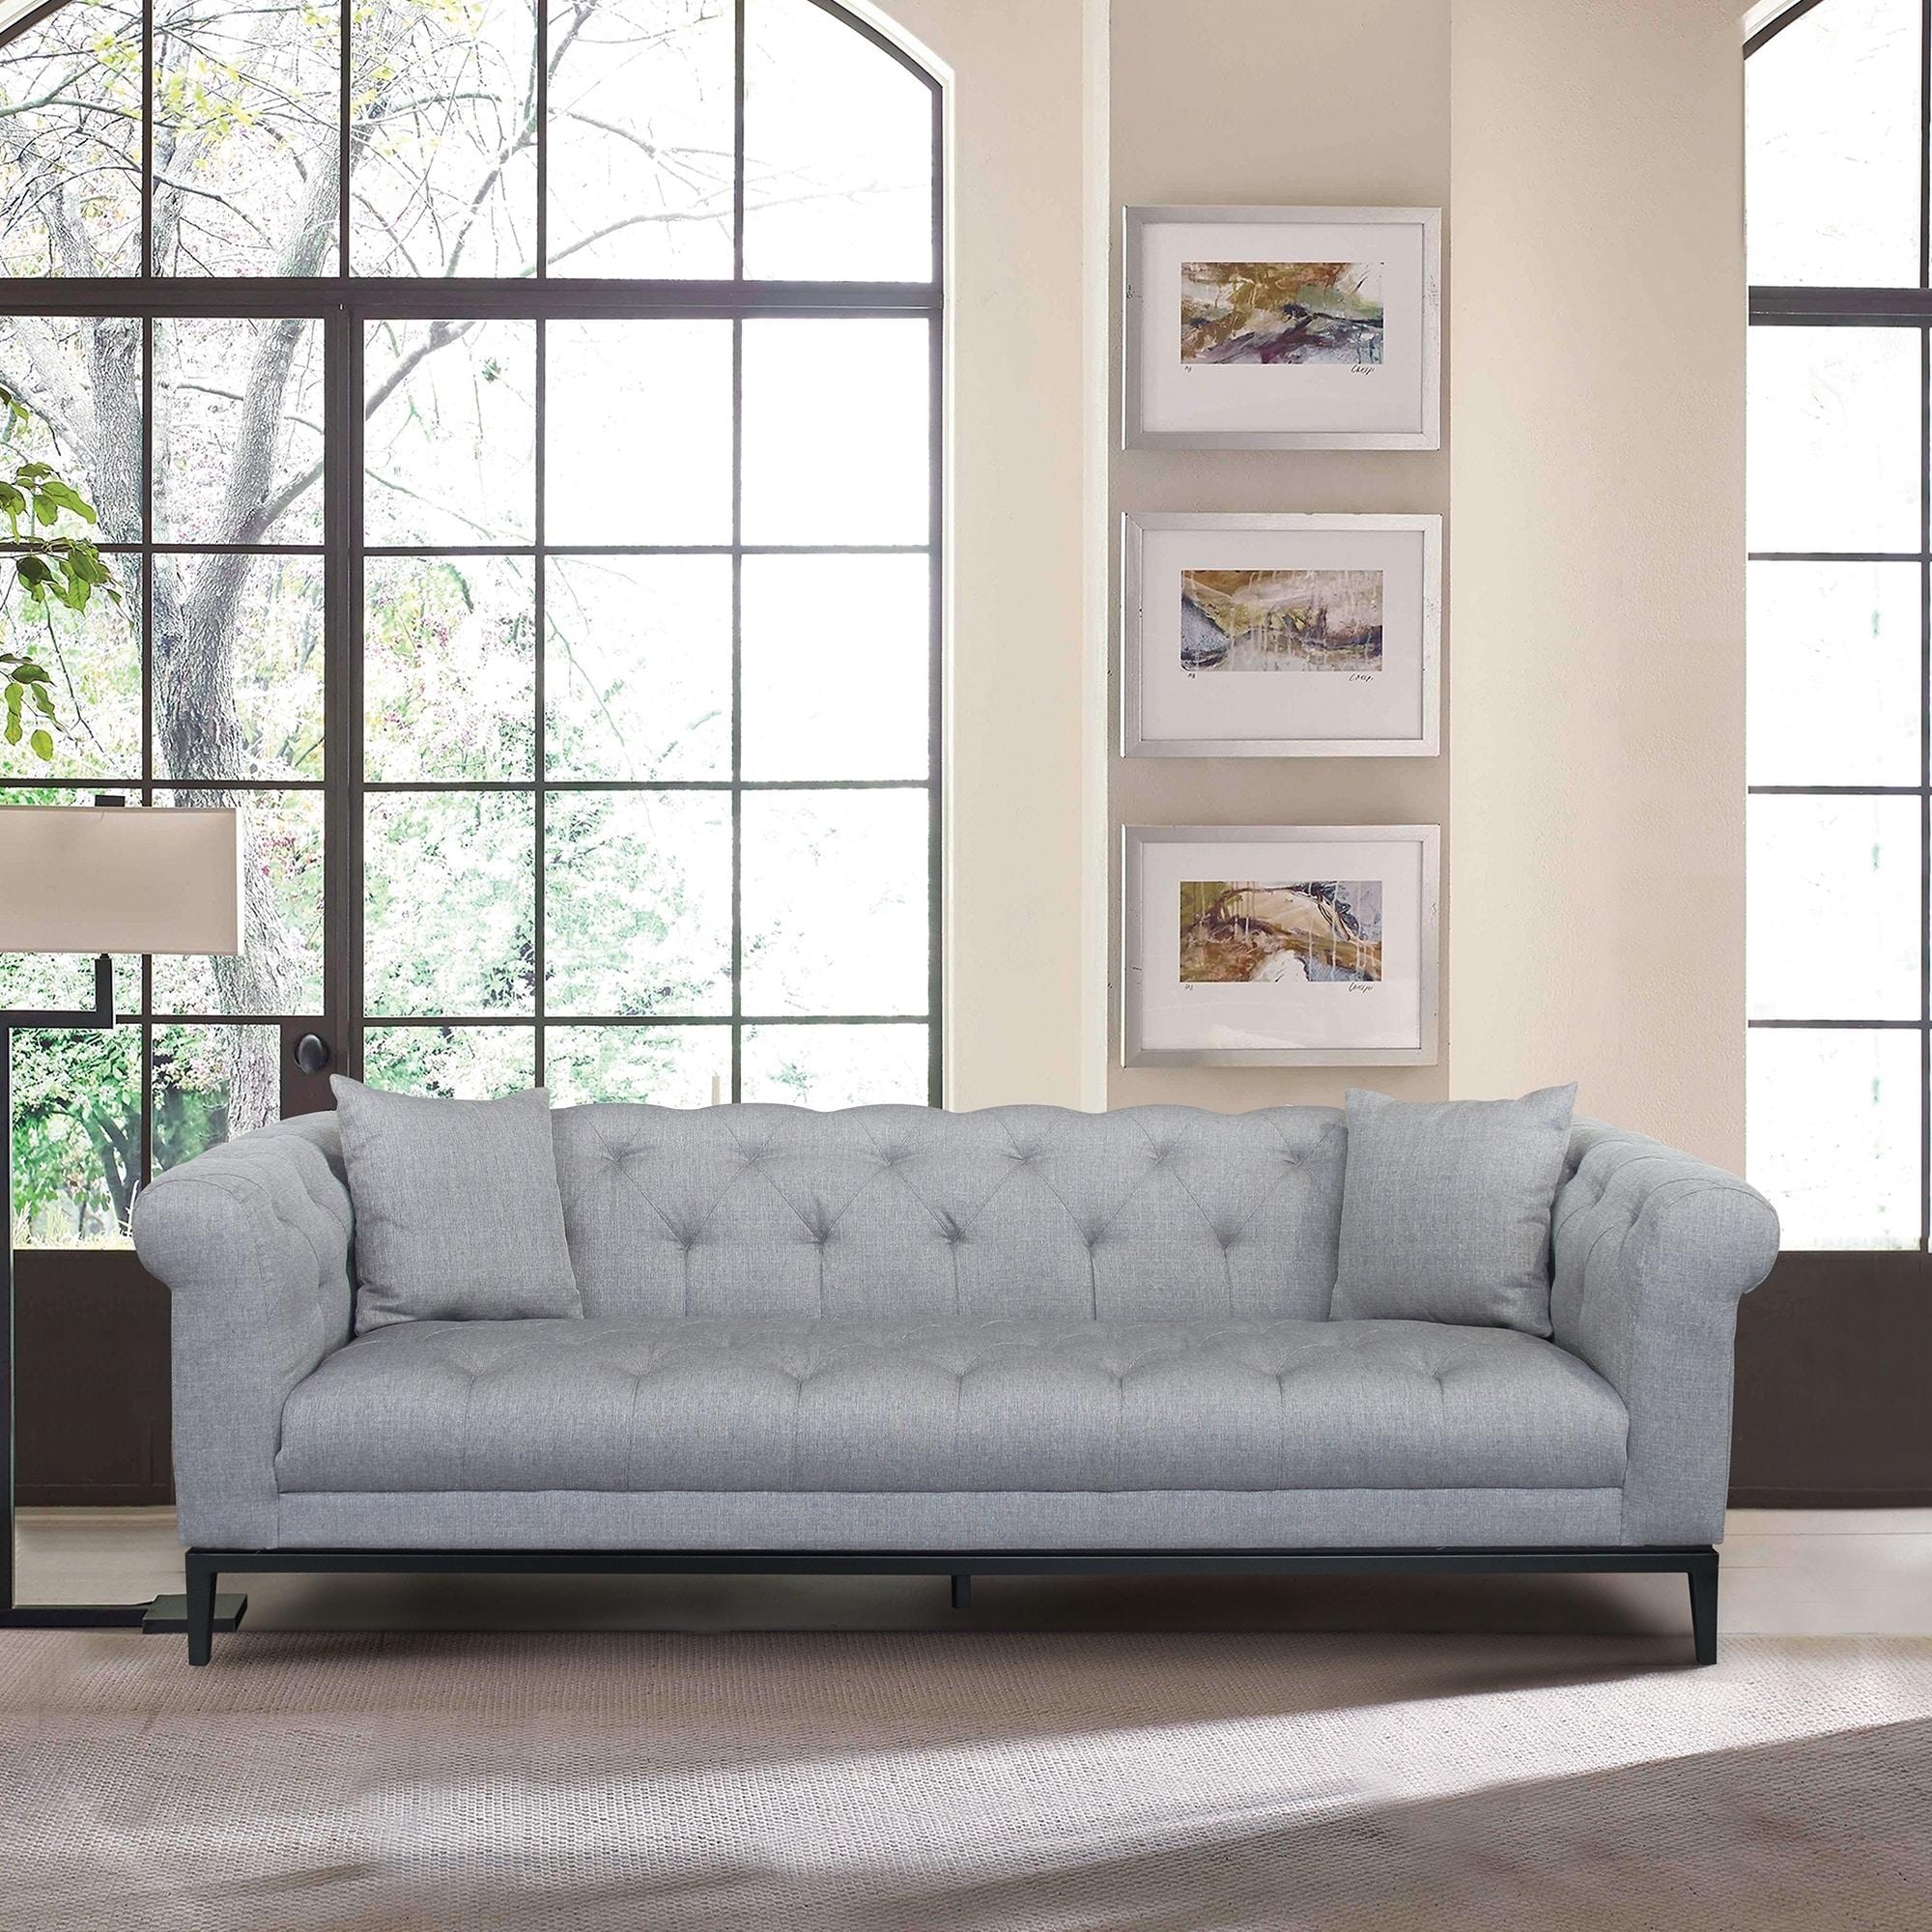 Armen living glamour contemporary sofa with black iron finish base